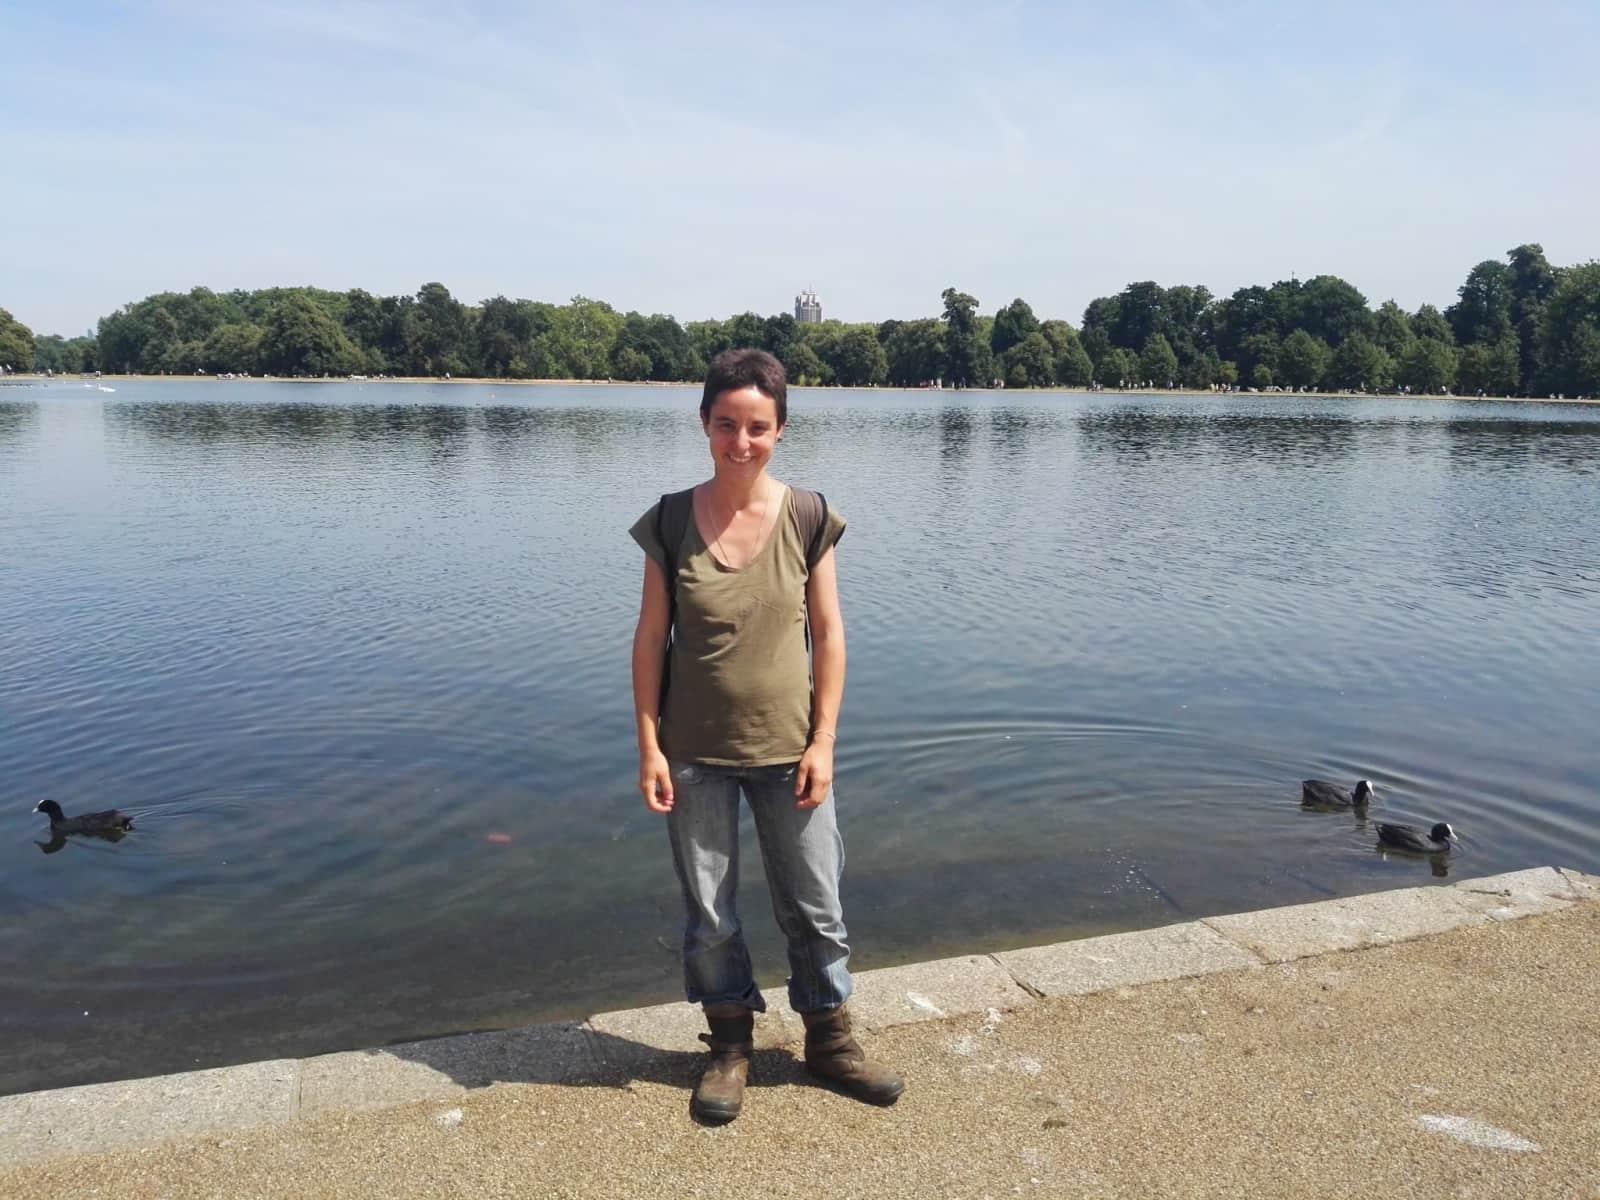 Giorgia from Hemel Hempstead, United Kingdom